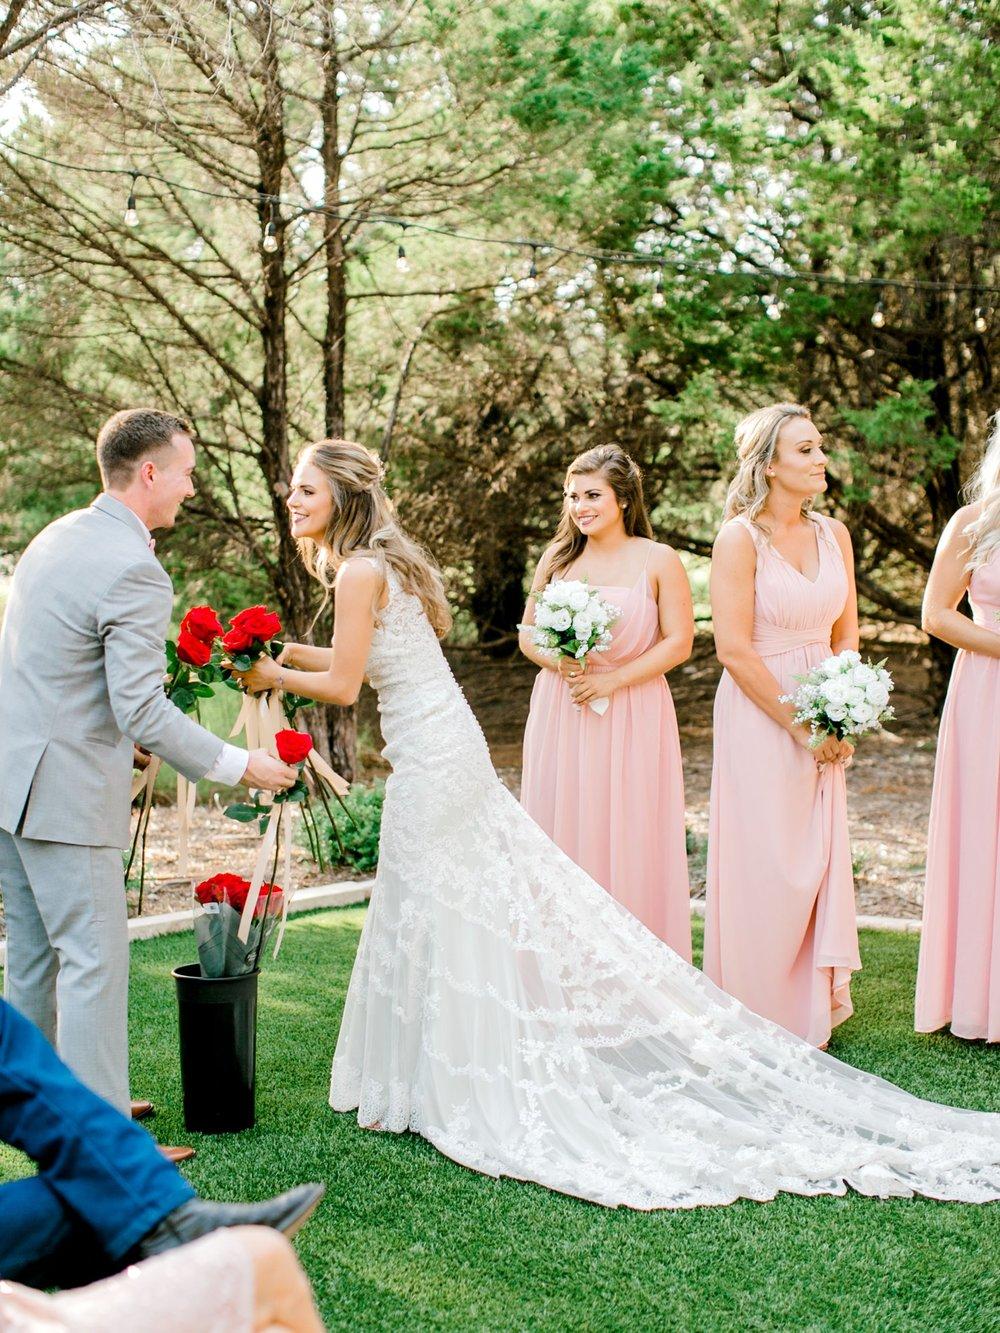 Aleah_and_Rowdy_Fenwick_Hidden_Creek_Events_Heath_Texas_Lubbock_Photographer_ALLEEJ_Weddings_0078.jpg